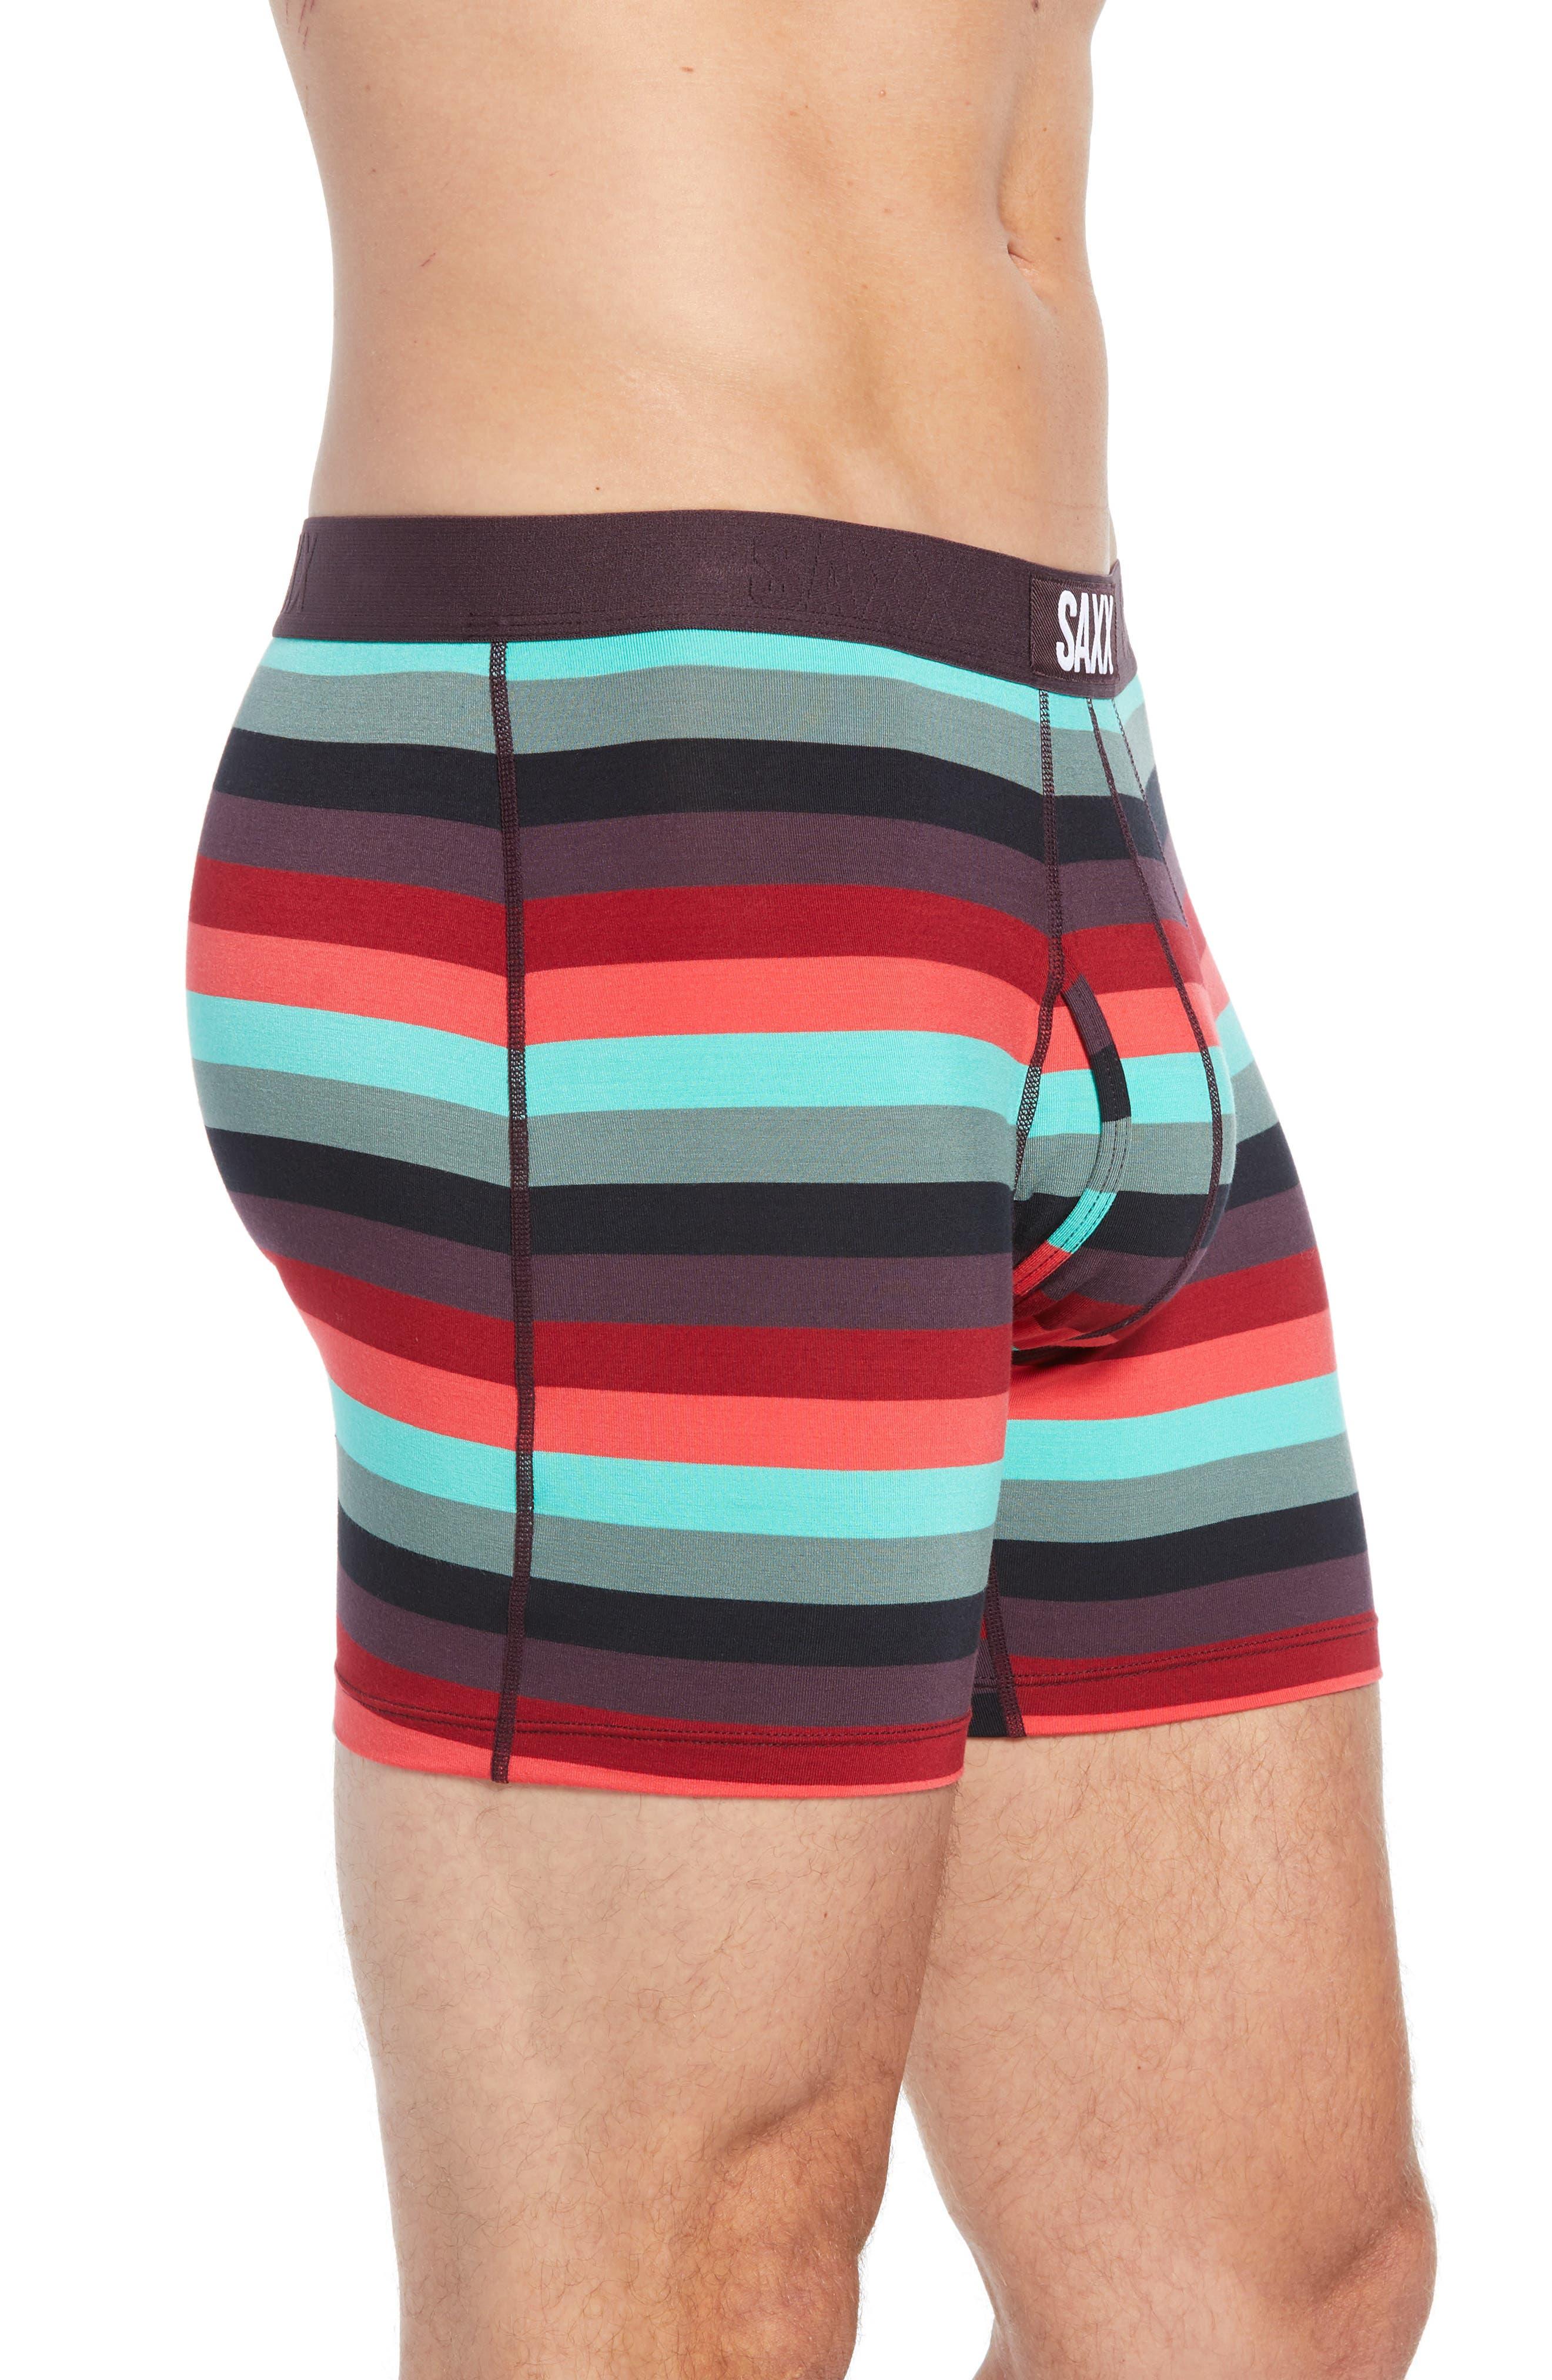 Ultra Cabana Stripe Stretch Boxer Briefs,                             Alternate thumbnail 3, color,                             BERRY CABANA STRIPE